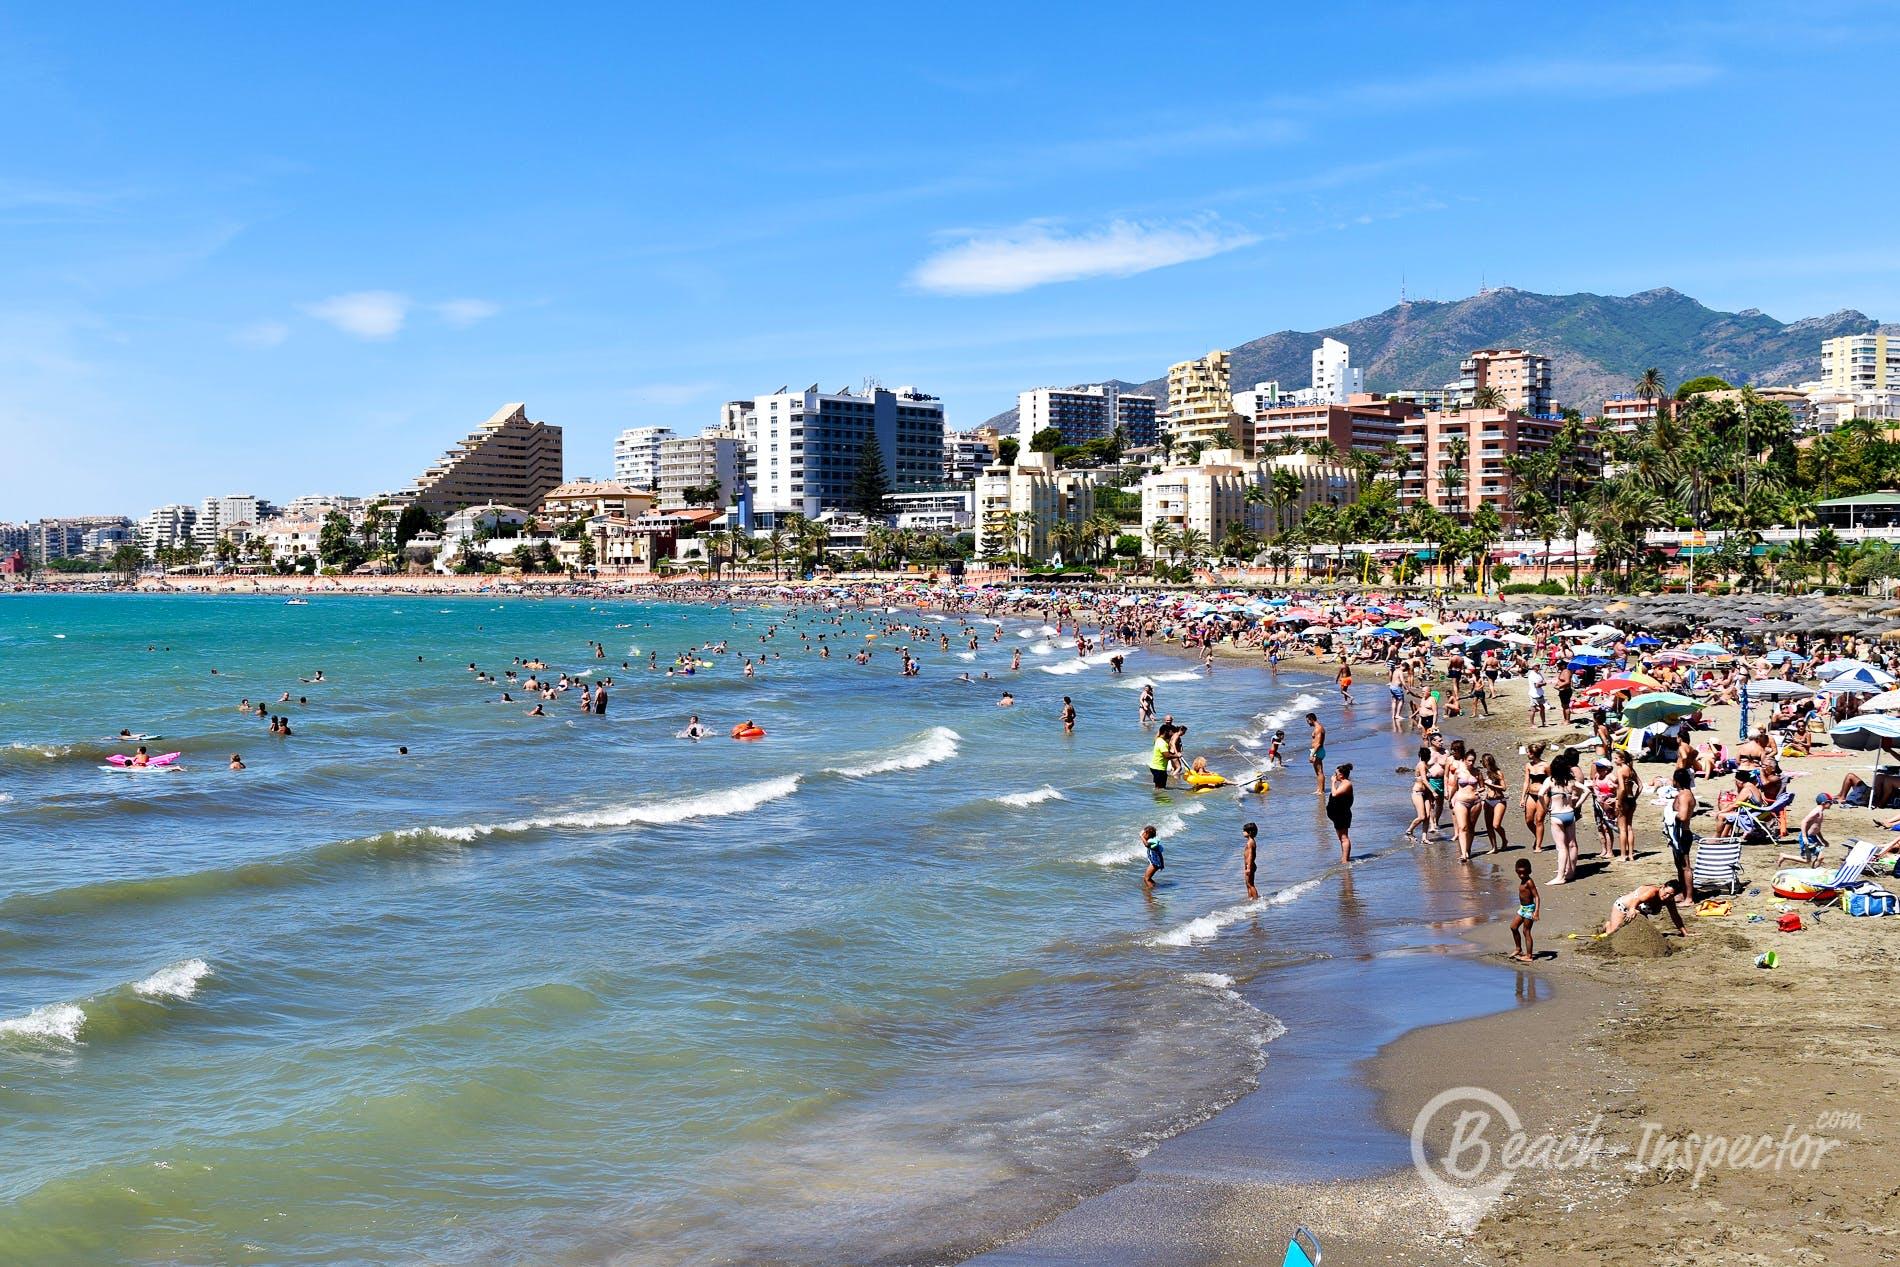 Beach Playa Malapesquera, Costa del Sol, Spain